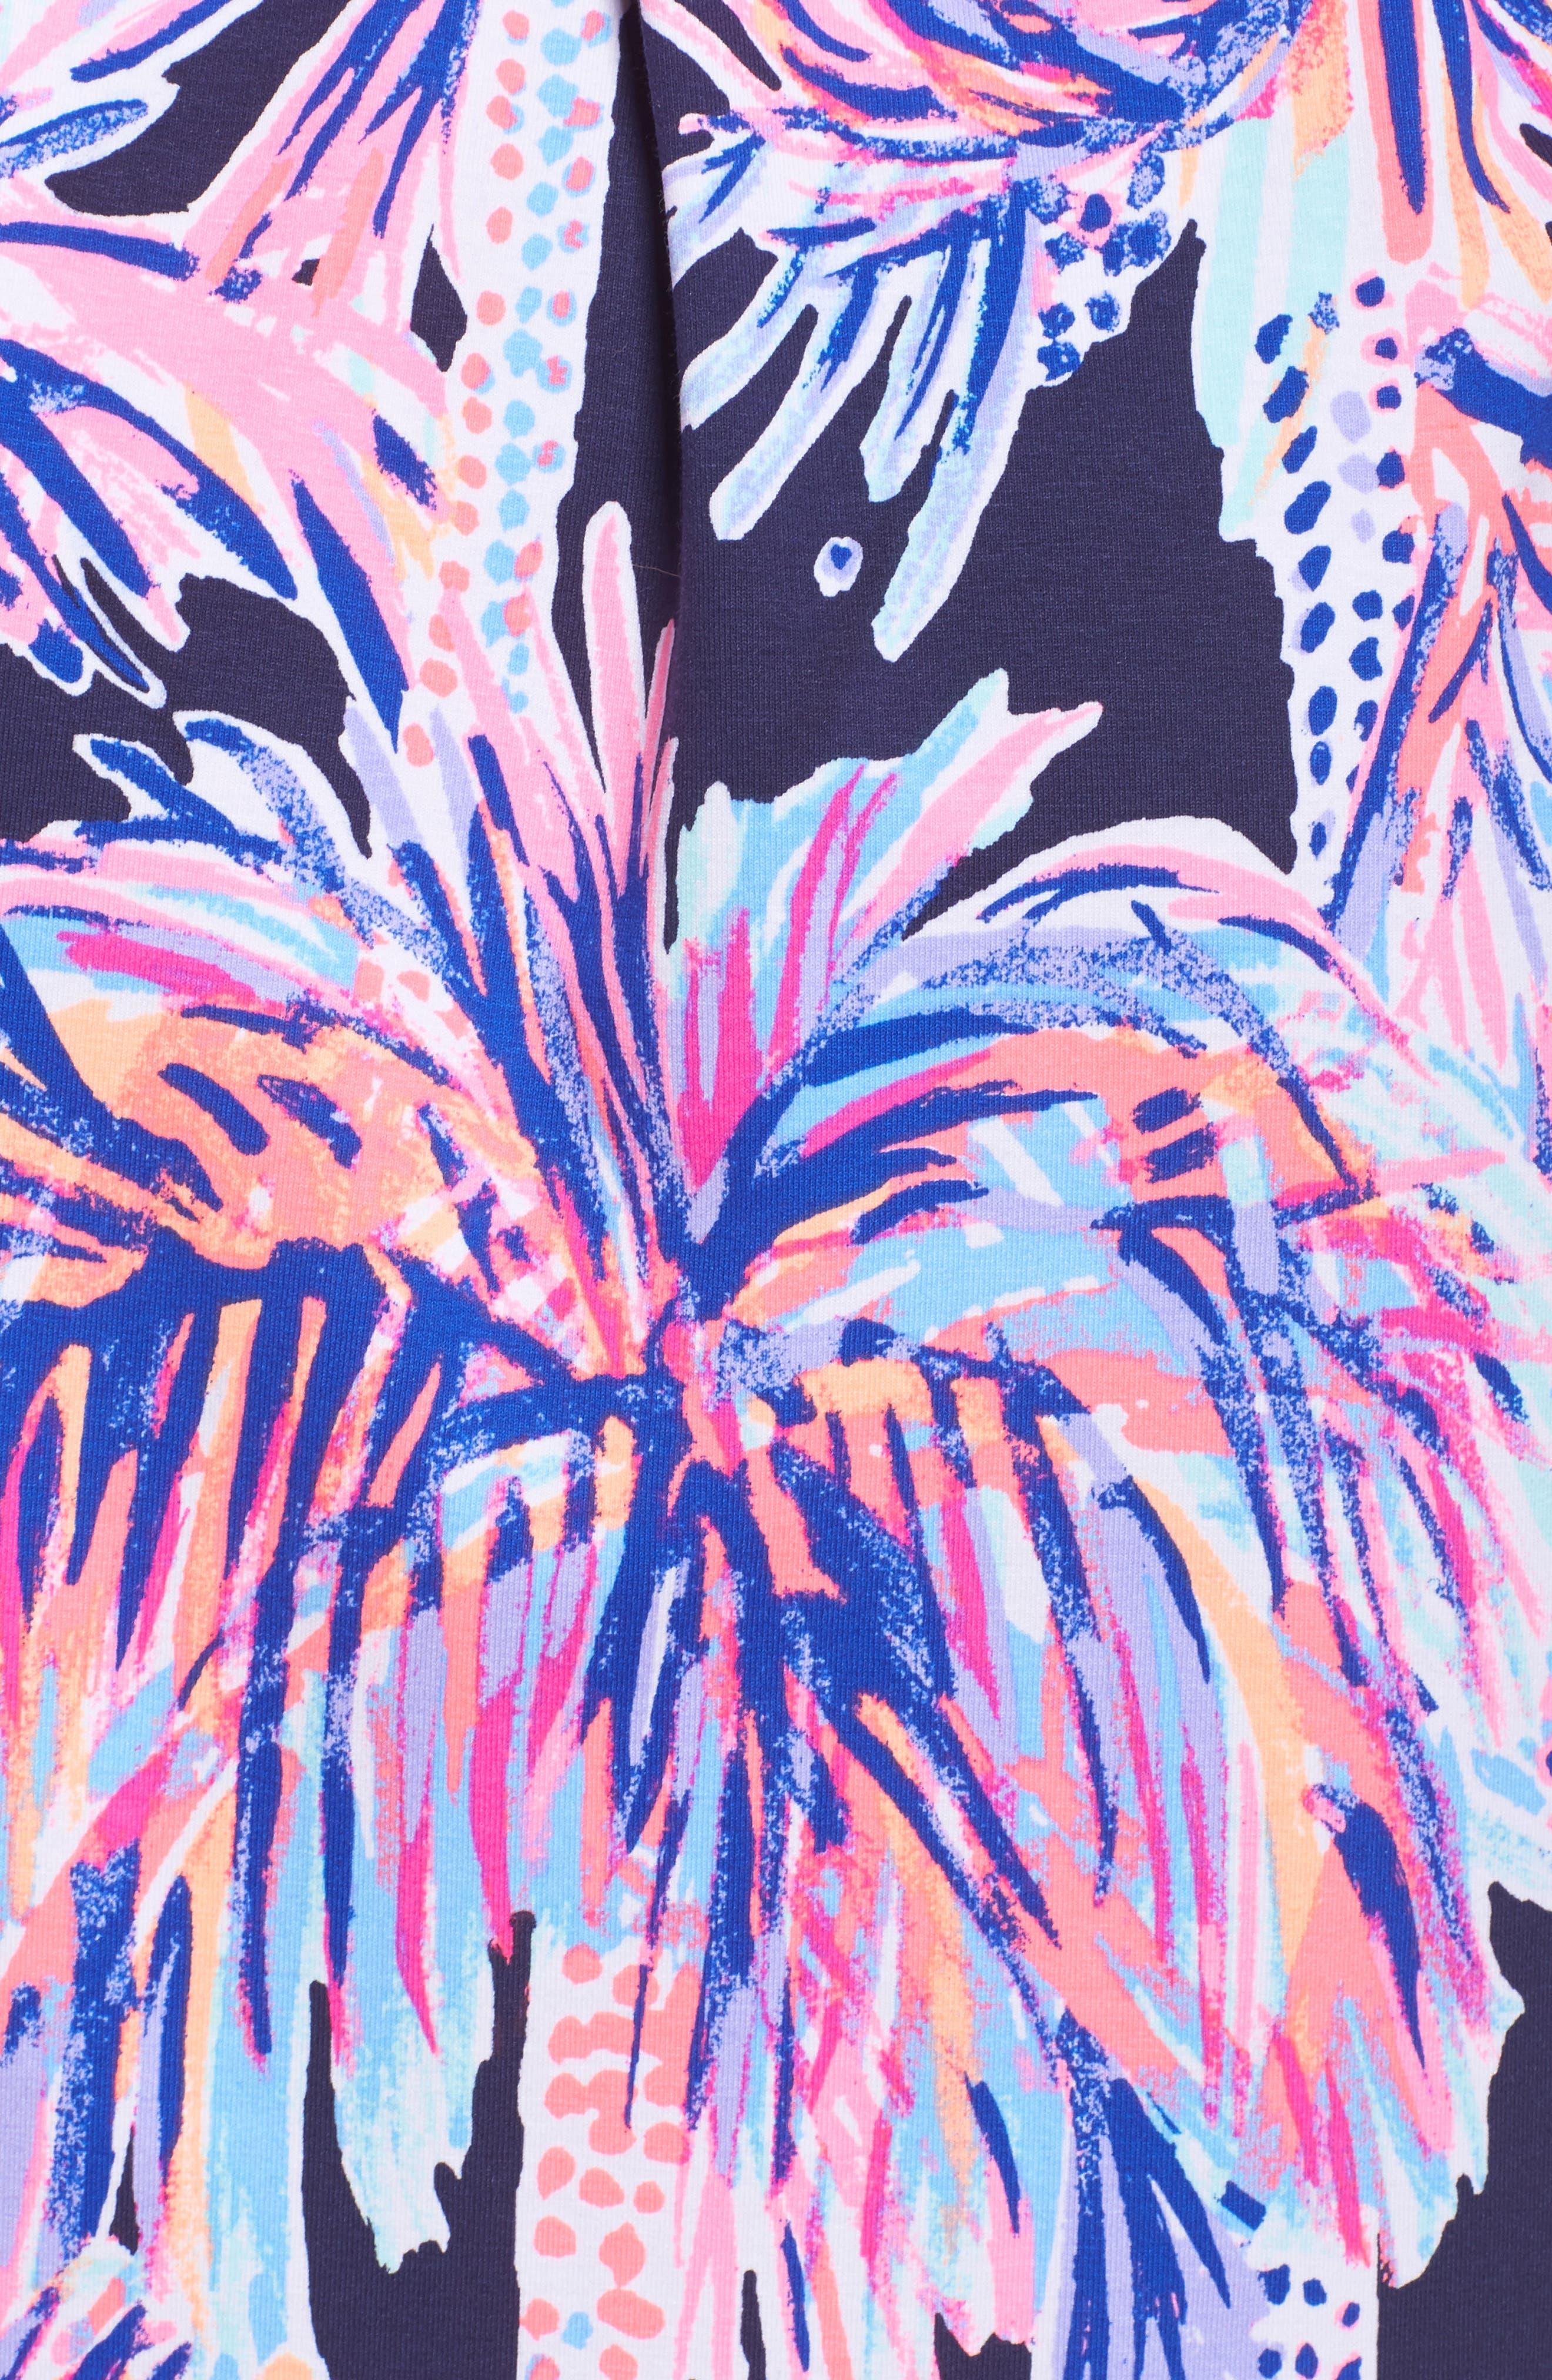 Bailor Shirtdress,                             Alternate thumbnail 5, color,                             Bright Navy Palms Up